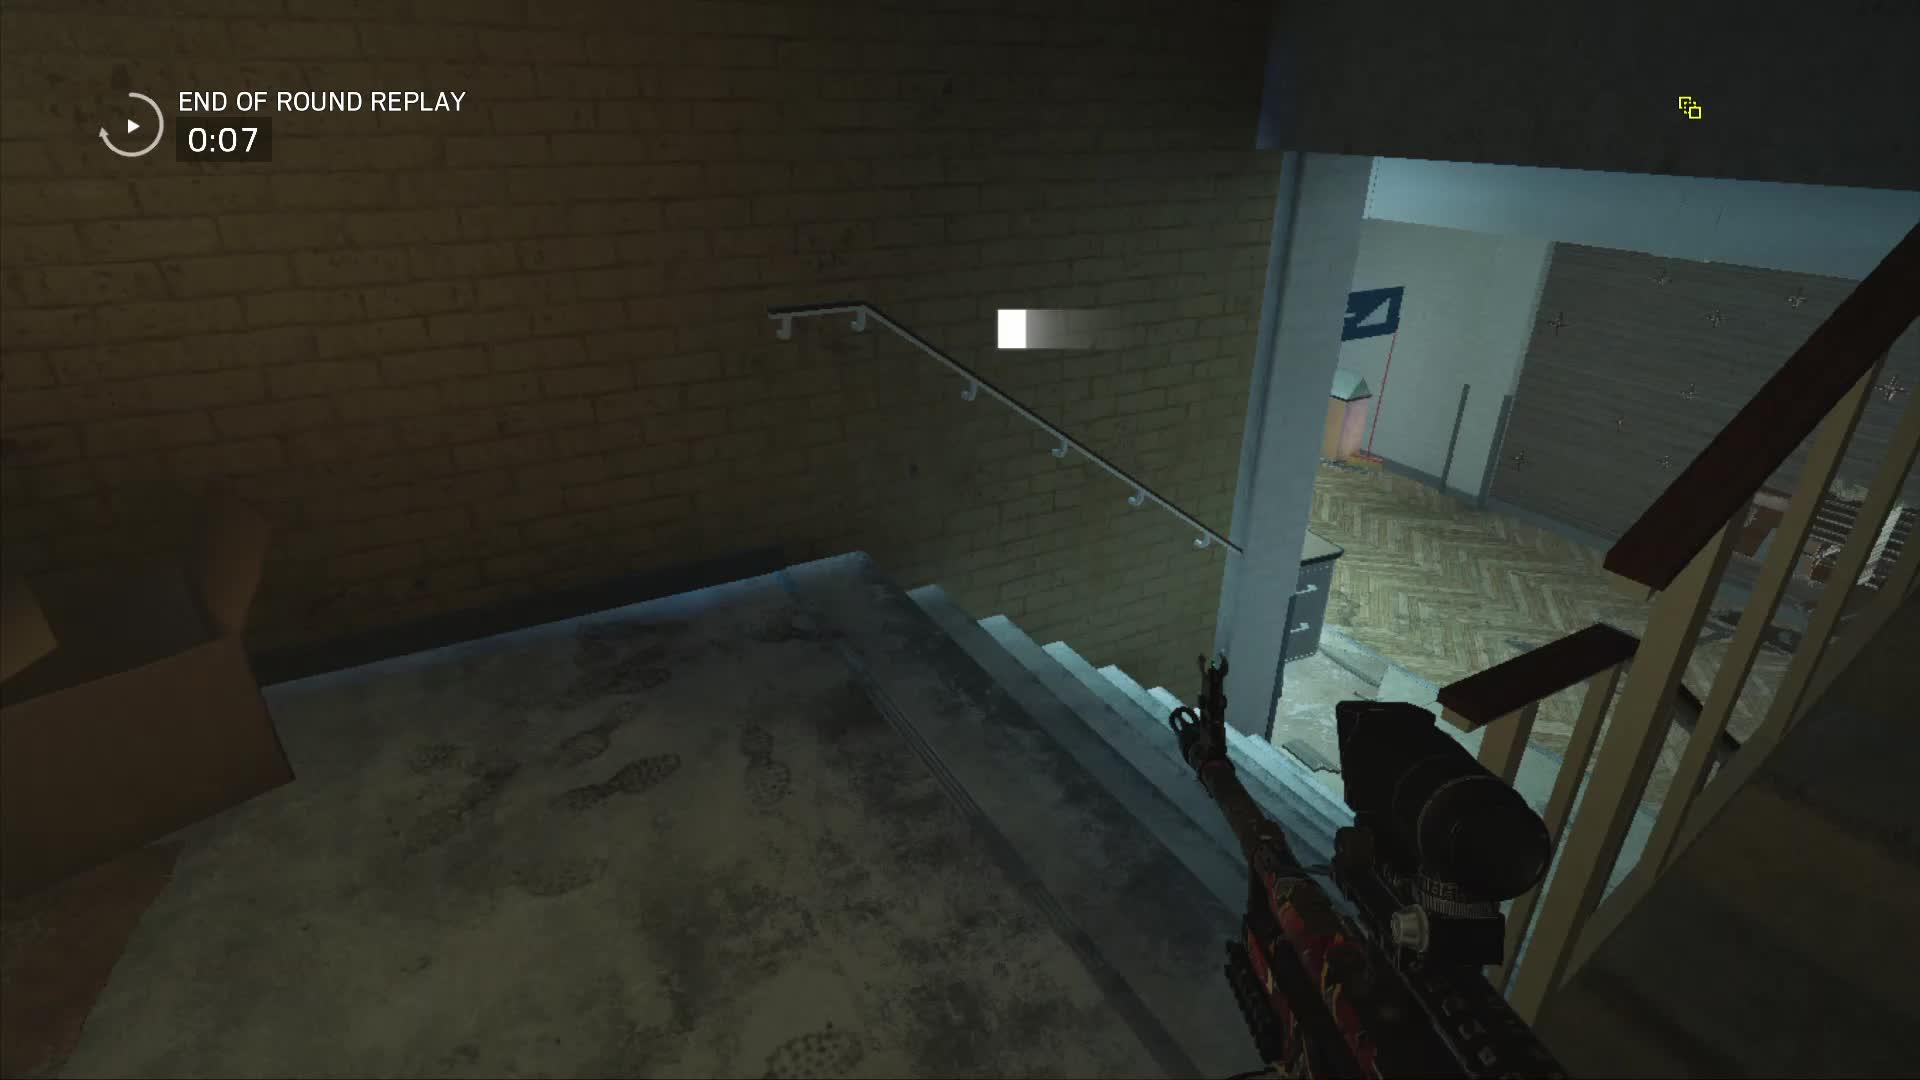 Rainbow Six Siege, Siege hostage bait GIFs